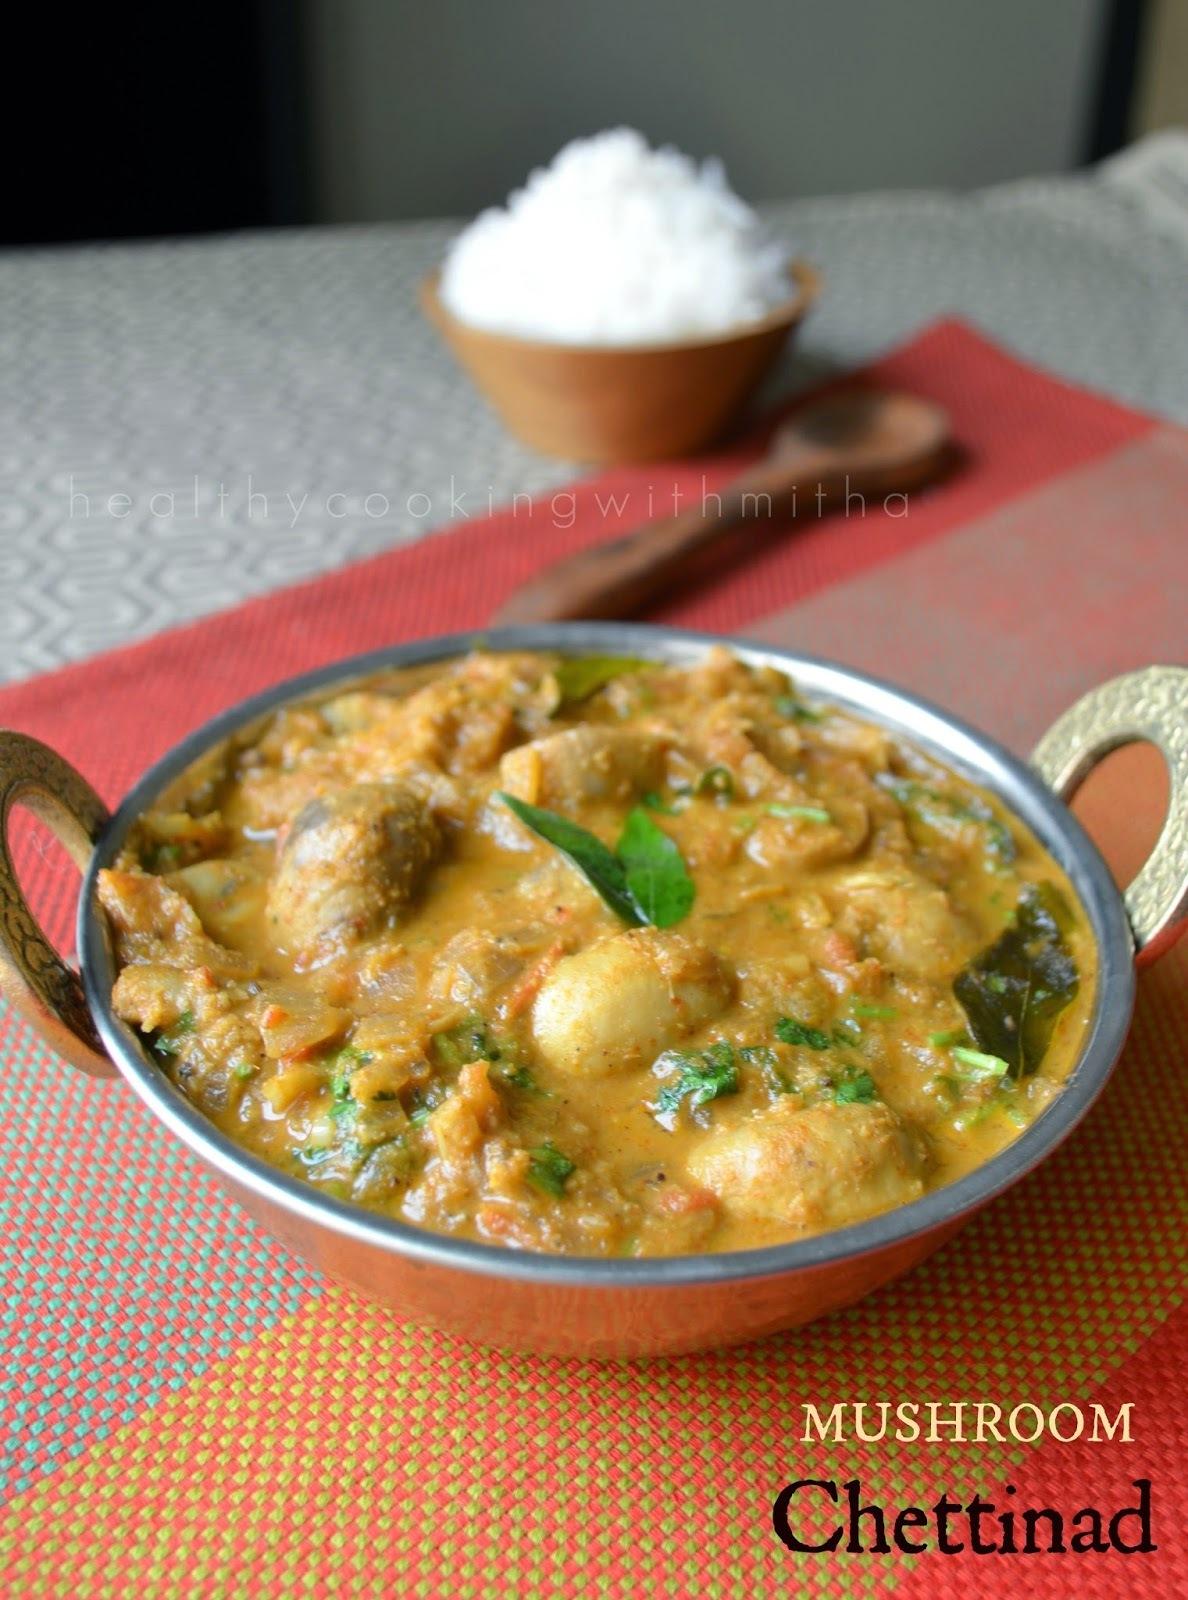 Mushroom Chettinad | Spicy Mushroom gravy